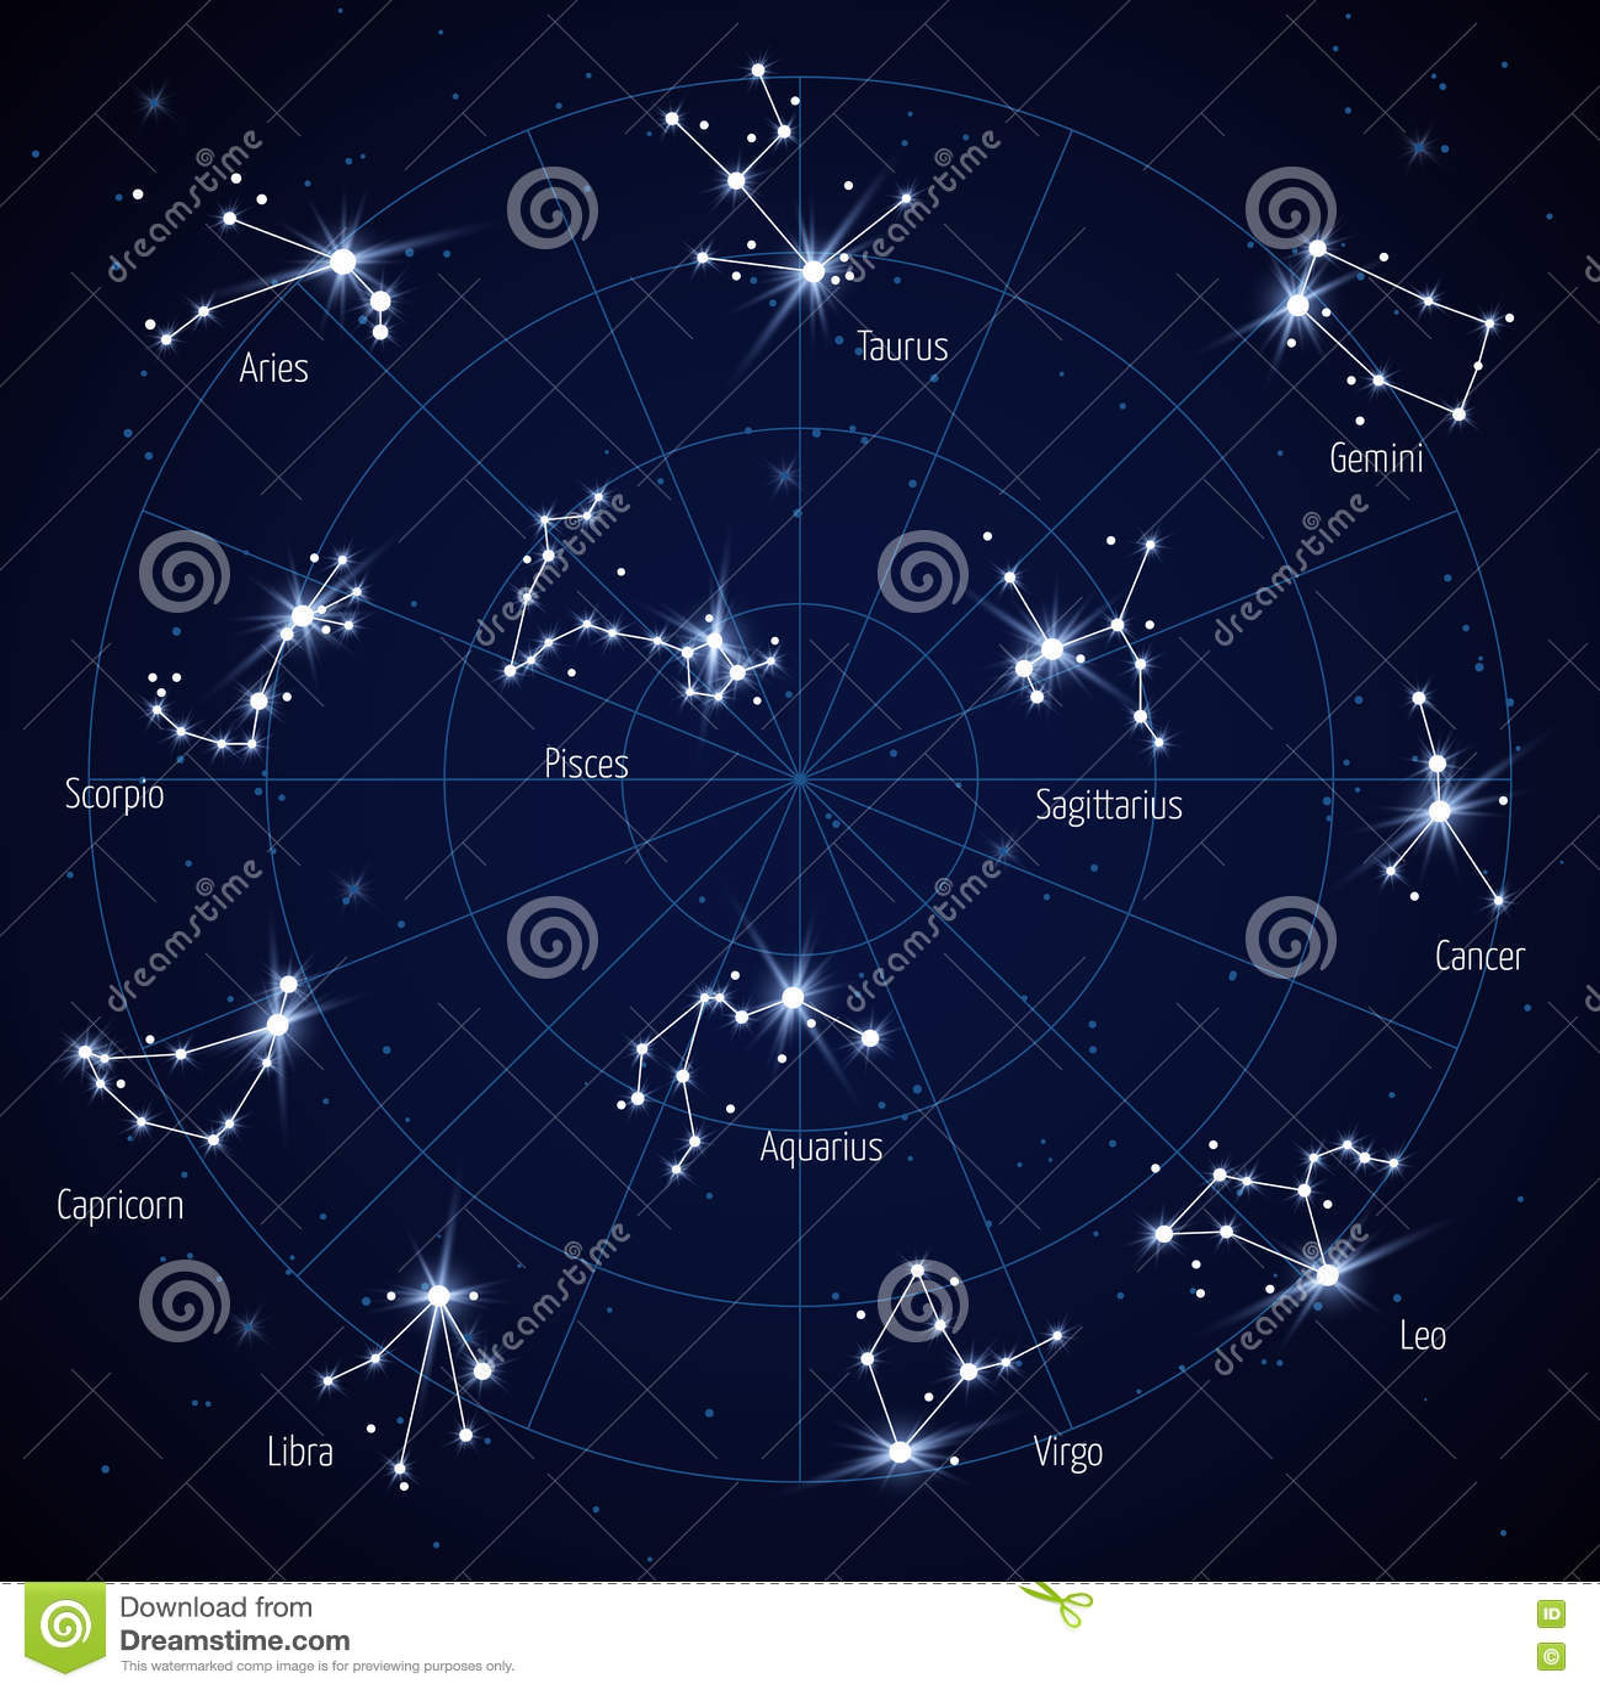 Astrology Videos For Kids